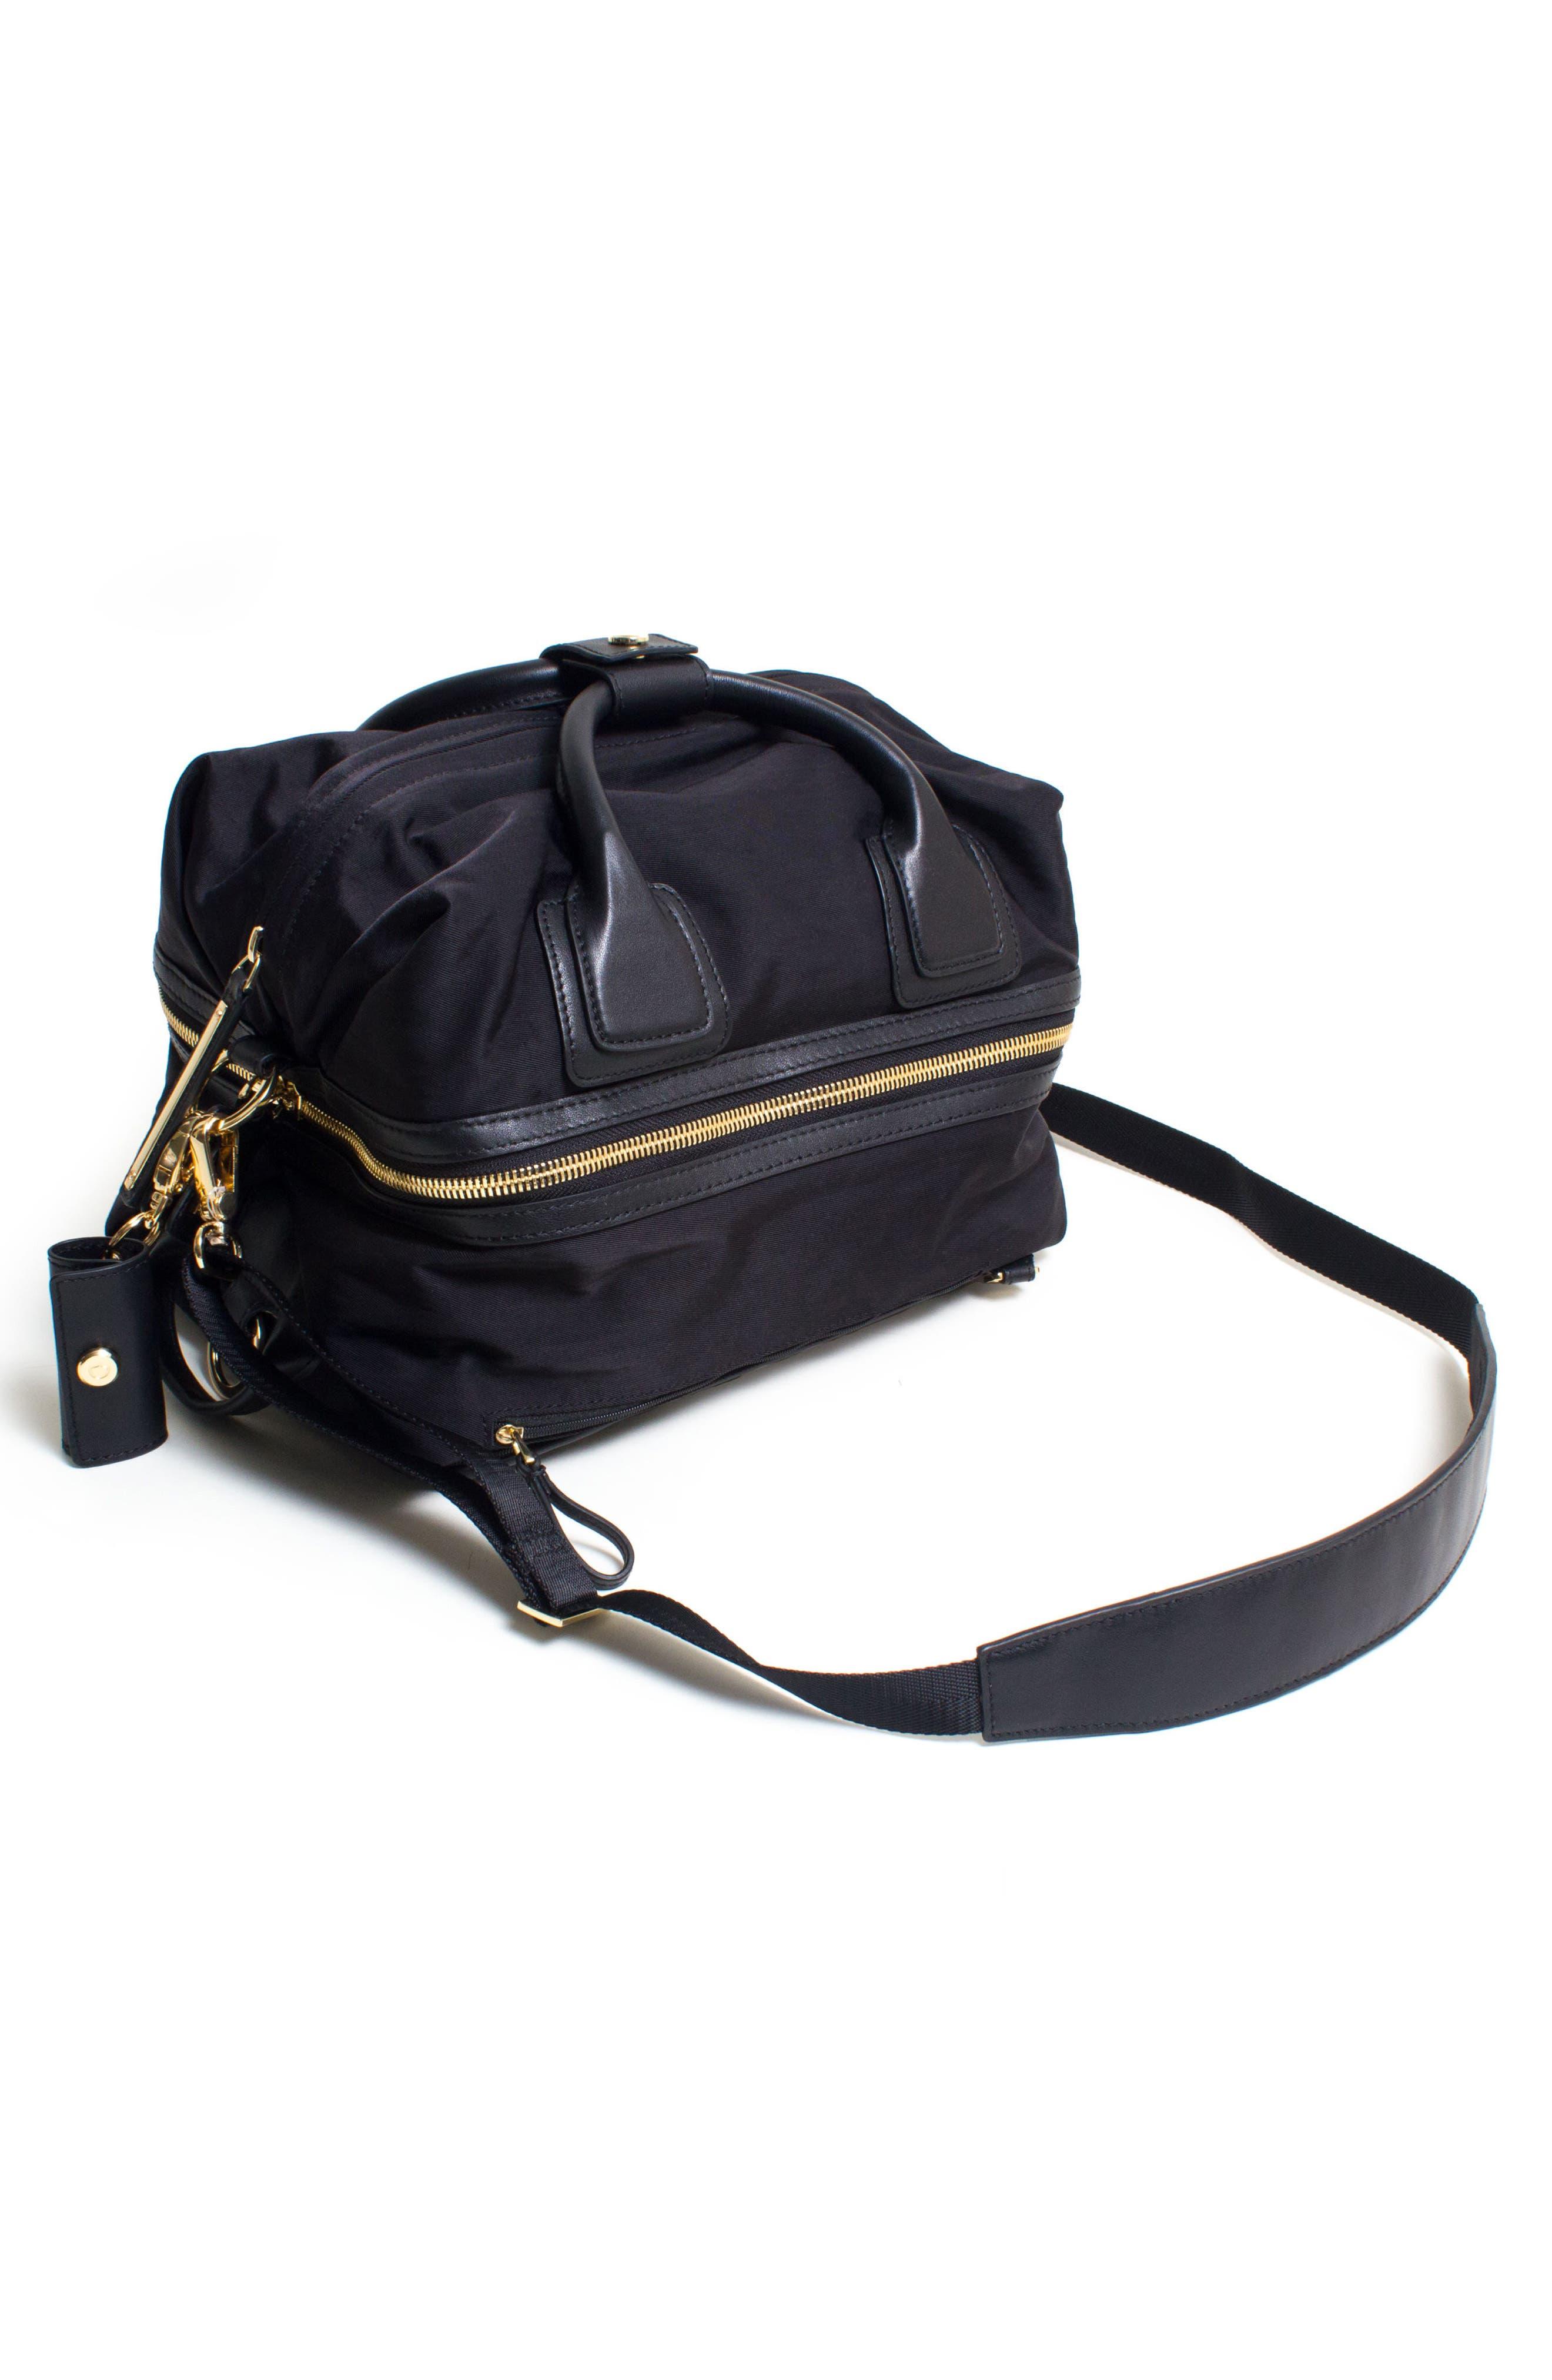 Studio Duffel Backpack,                             Alternate thumbnail 9, color,                             BLACK/ GOLD